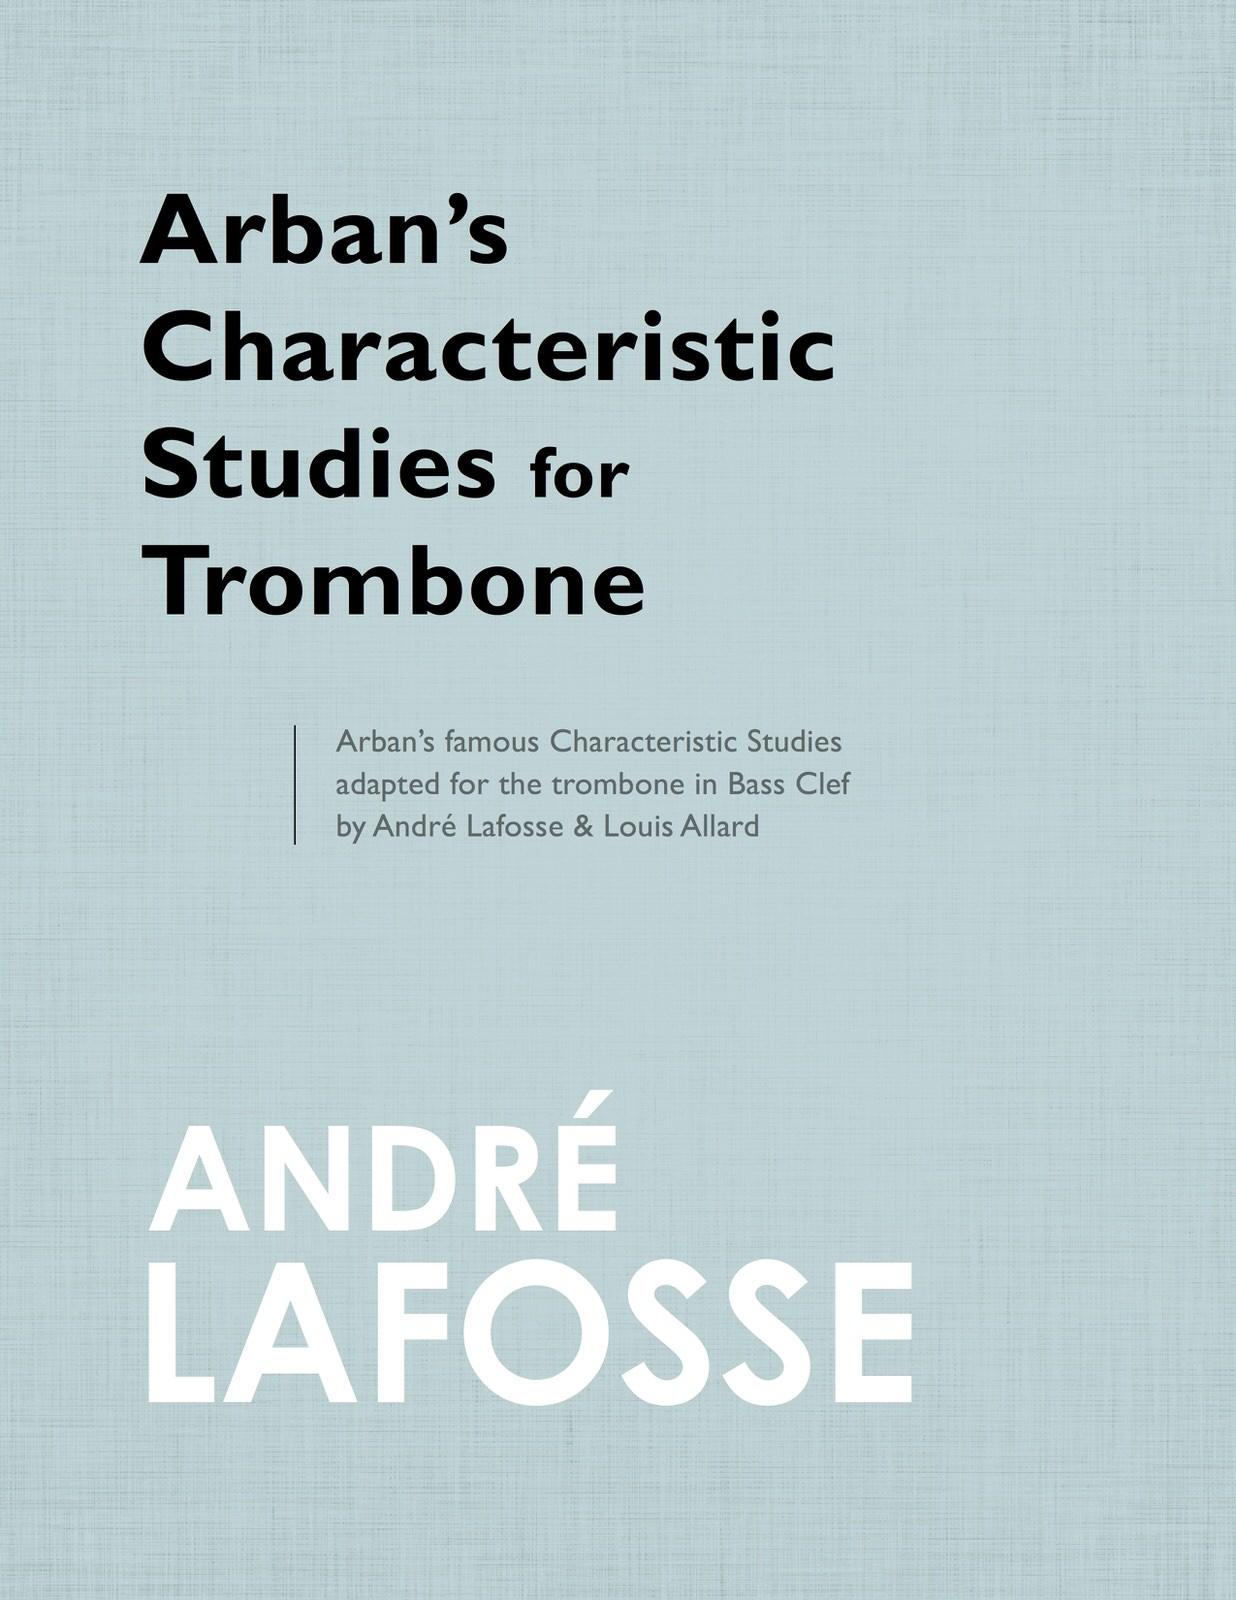 Allard, Lafosse, Arban Etudes Characteristiques-p01